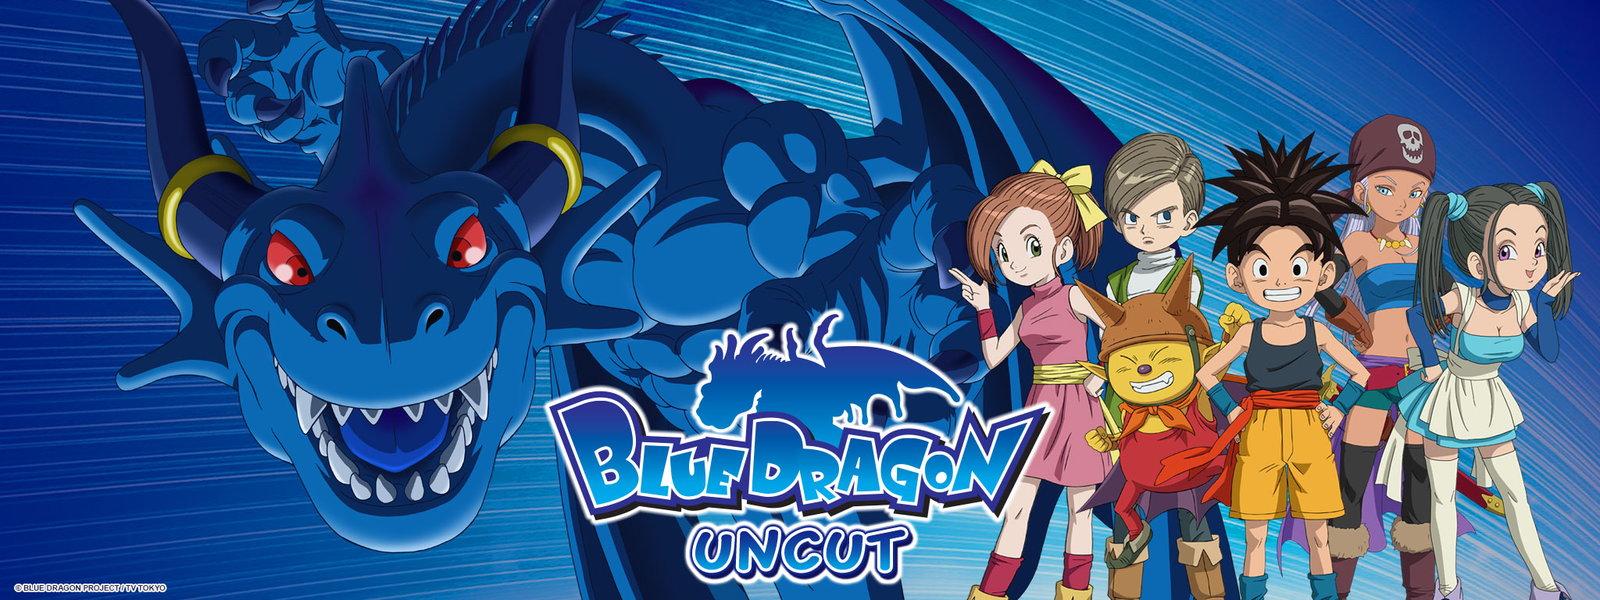 Blue Dragon Uncut